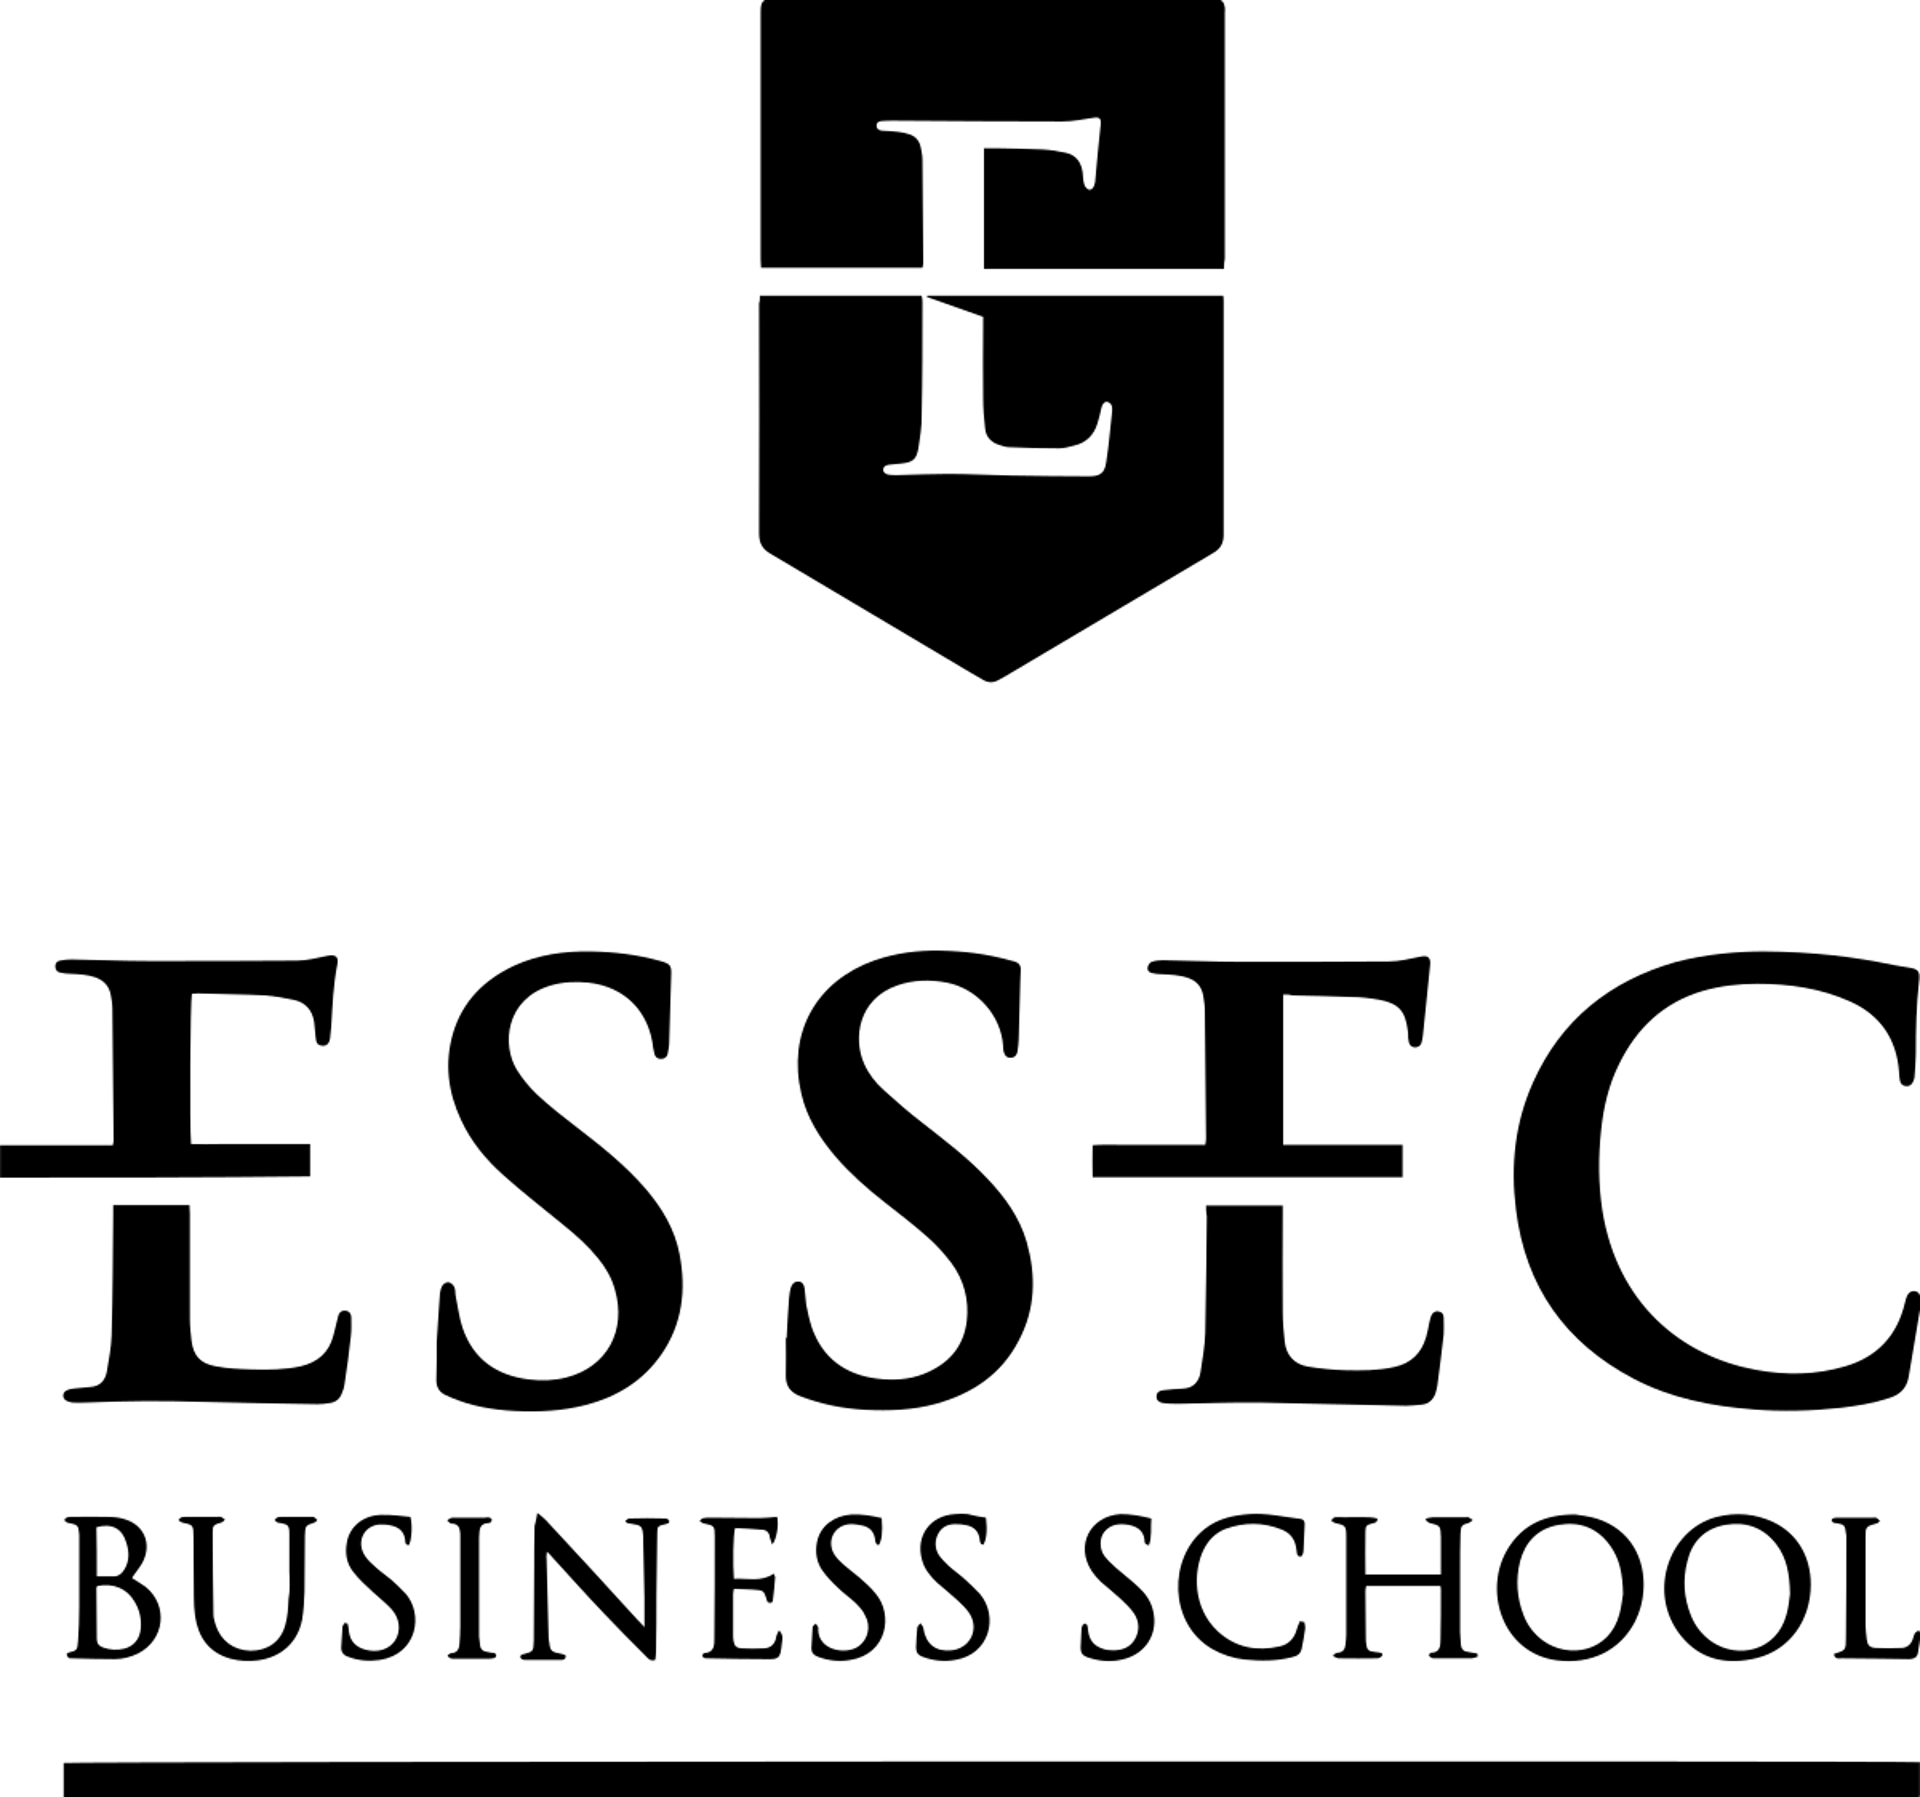 Logo 1546422166.png?ixlib=rb 1.1